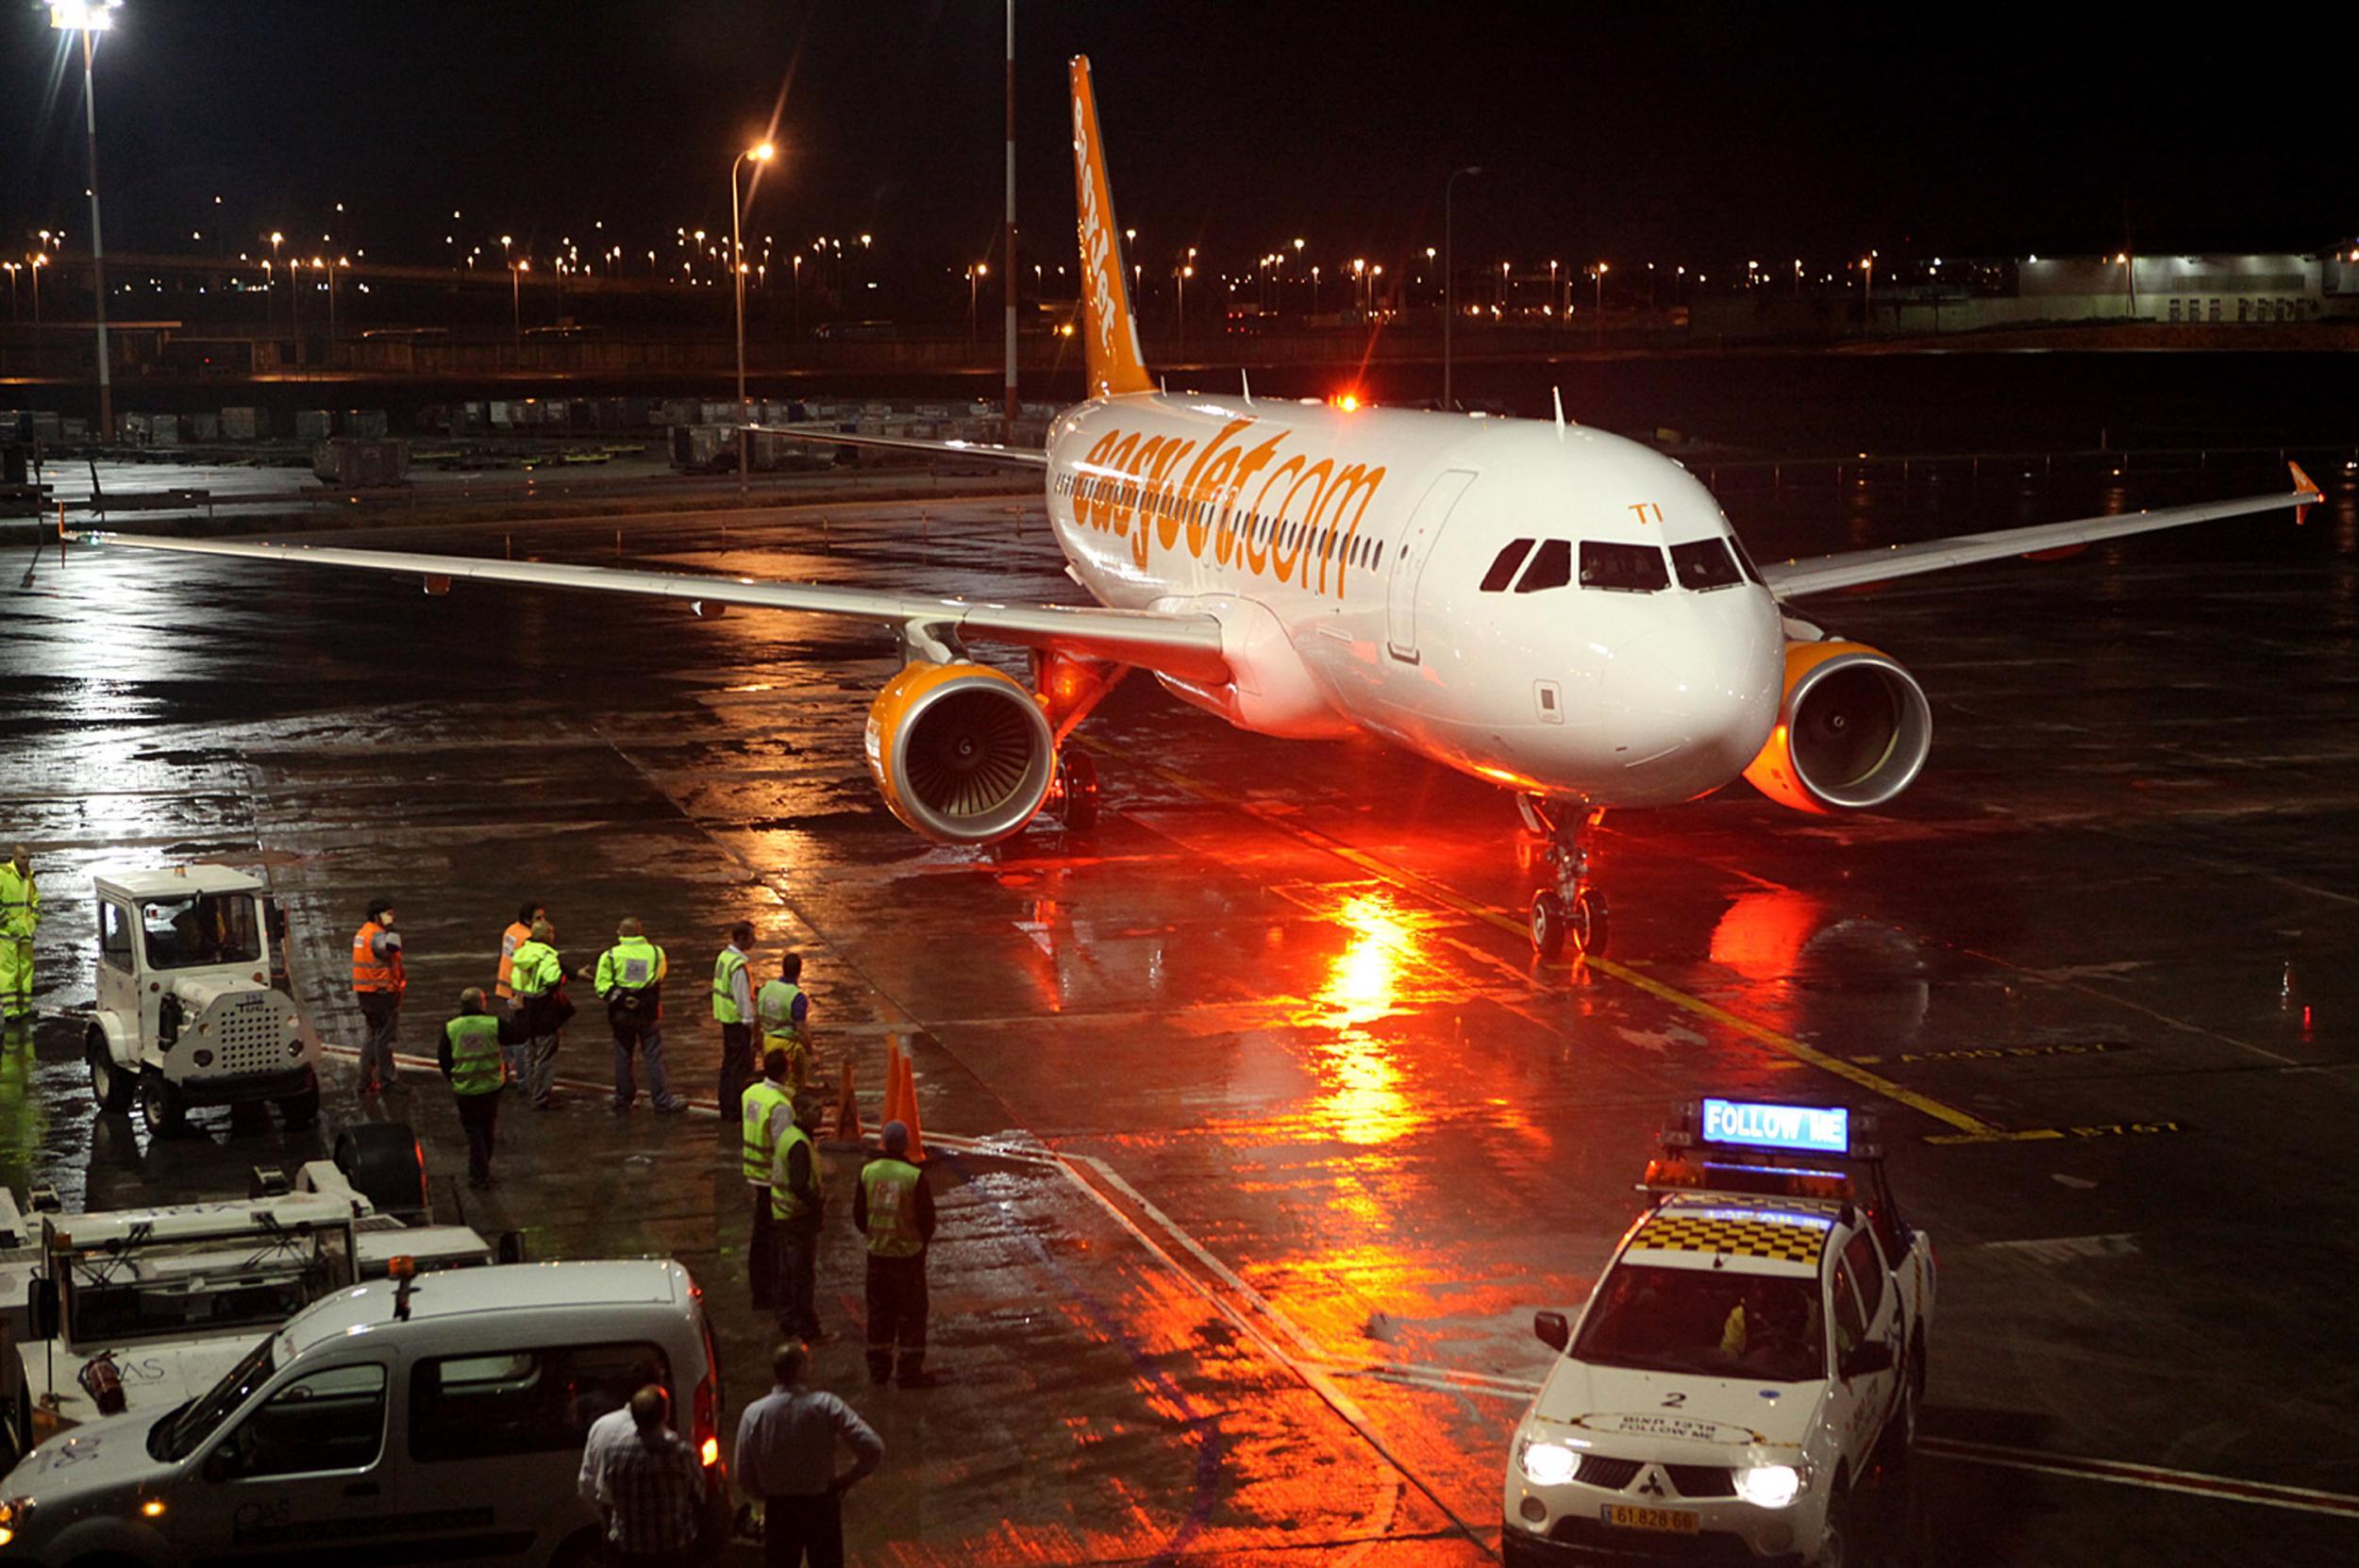 Half-term getaway wrecked by mass flight cancellations